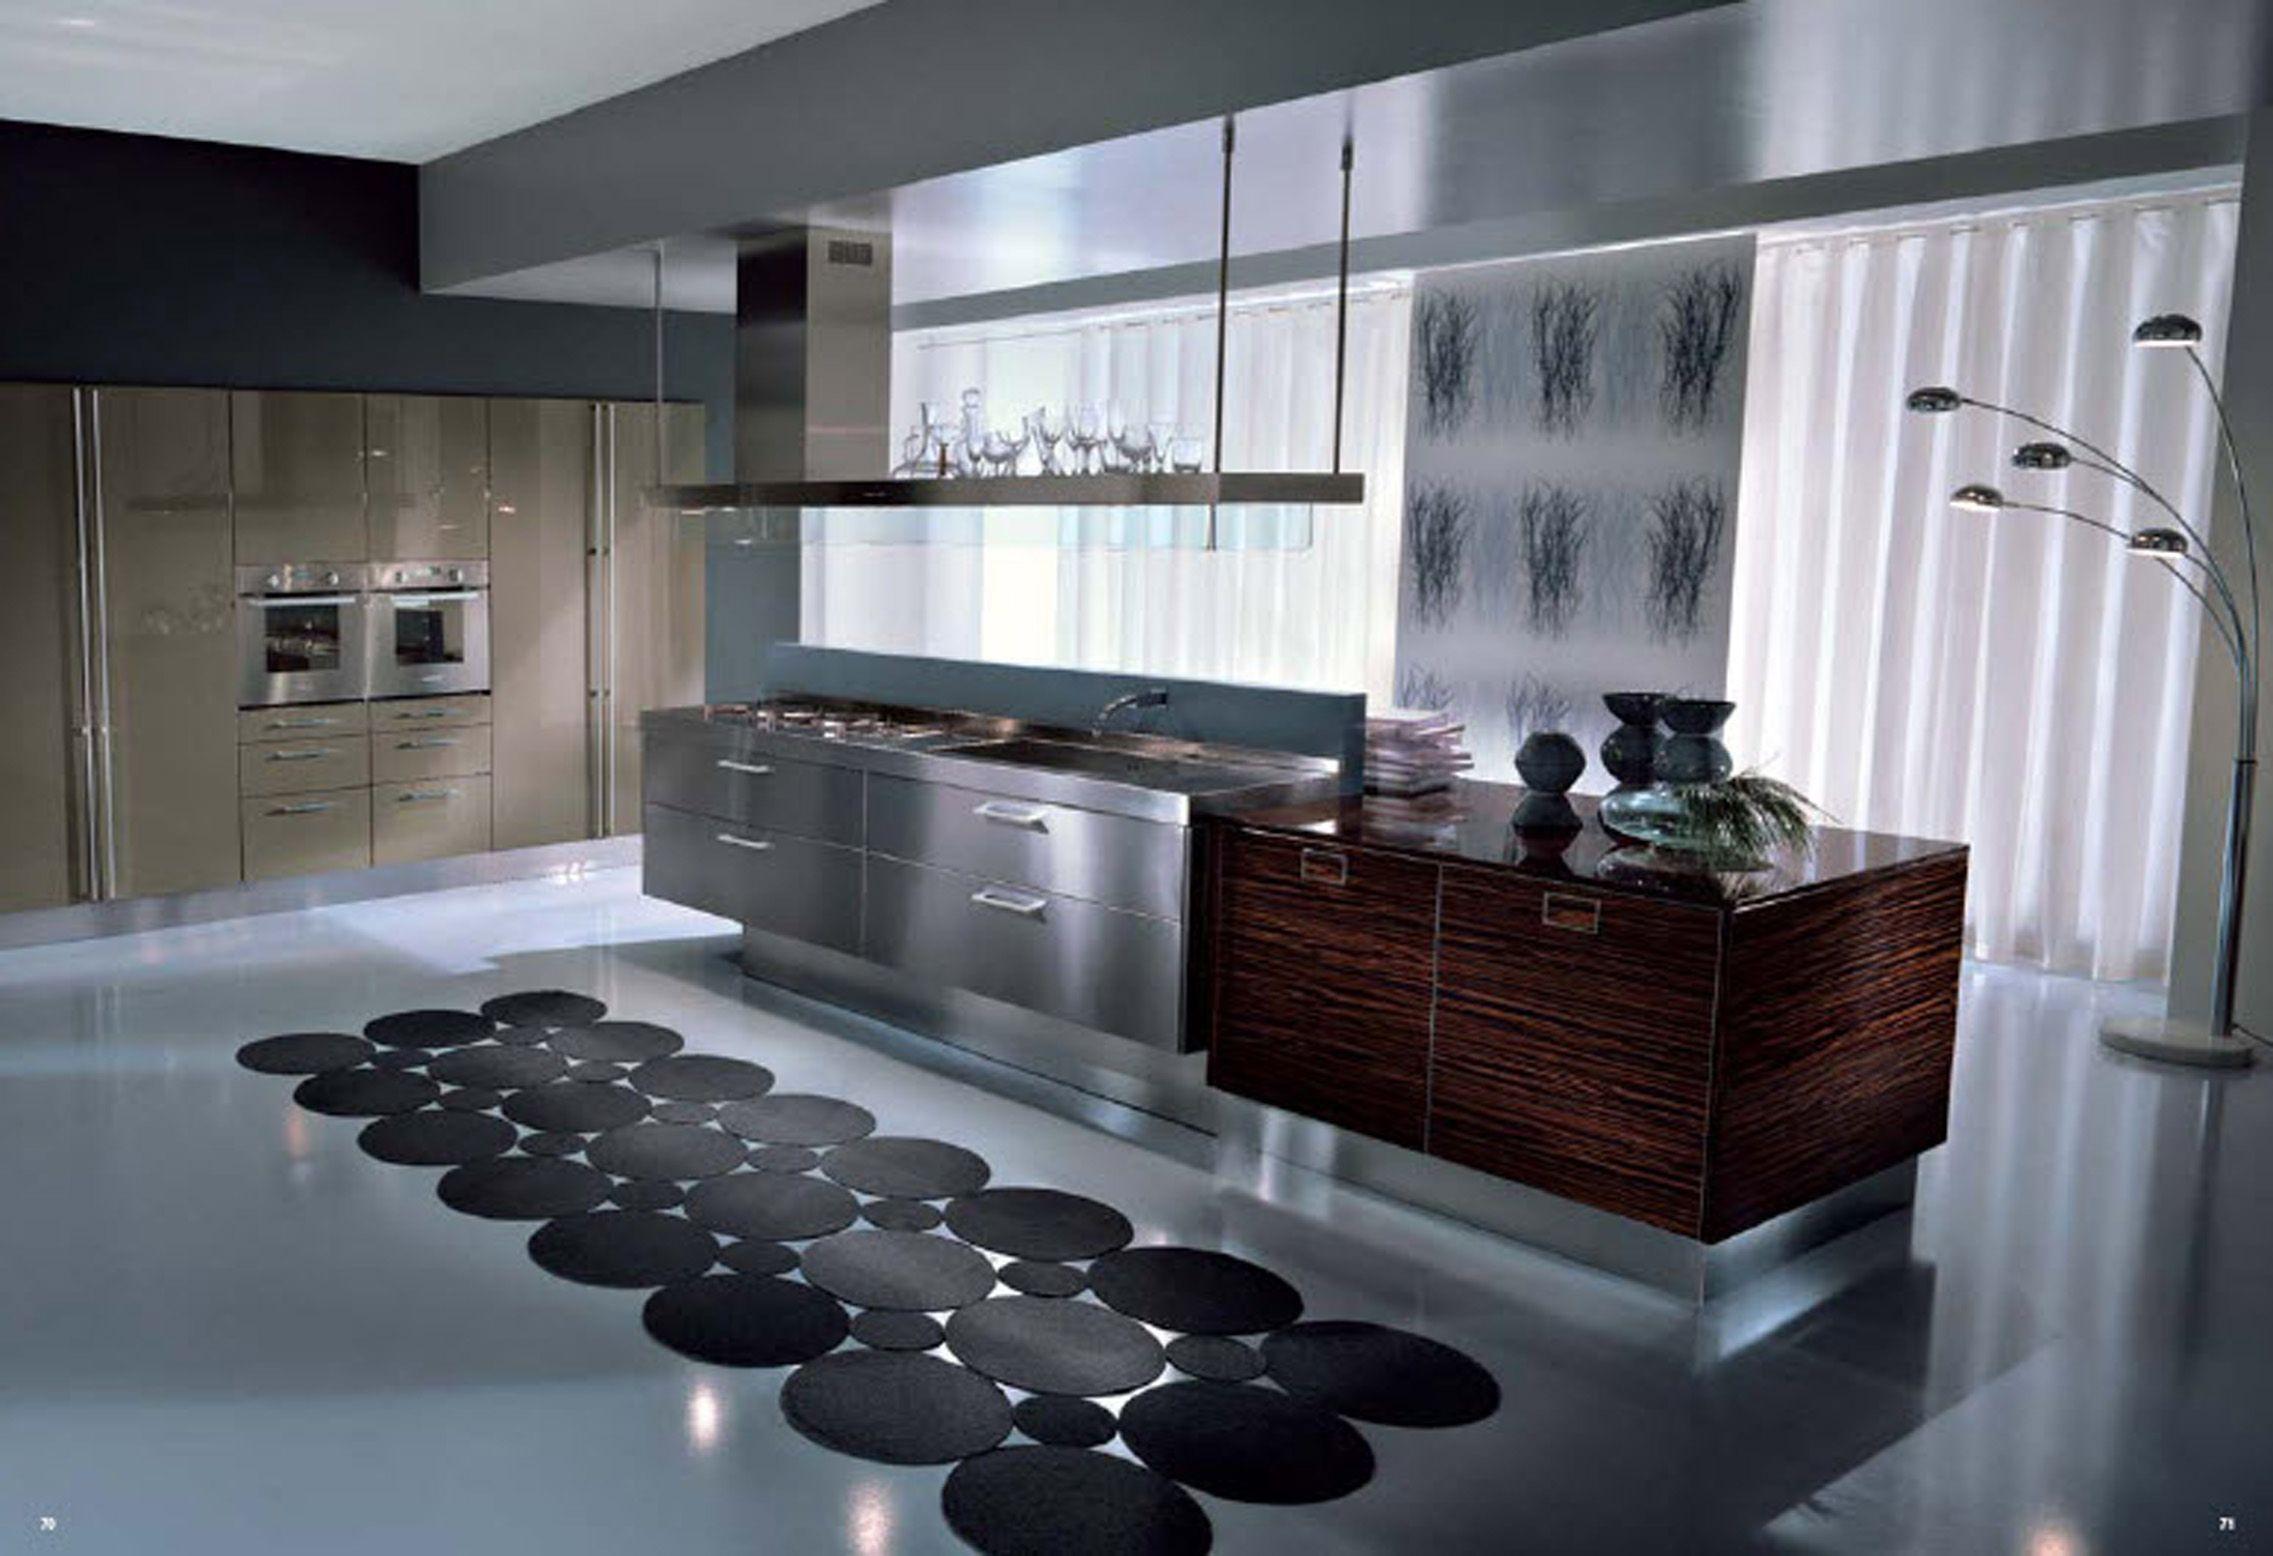 Modern kitchen design ideas photos innovative kitchen design ideas